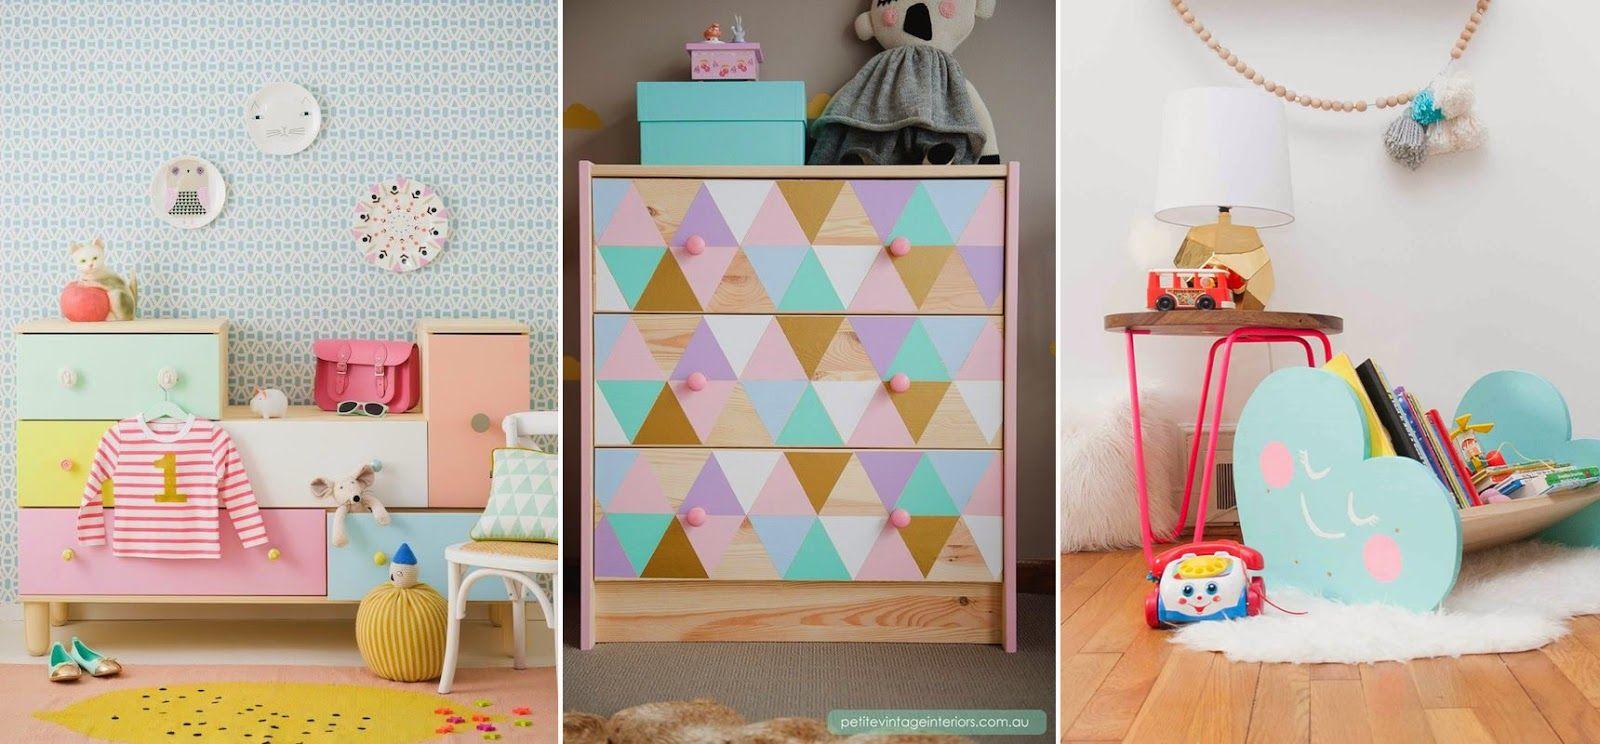 9 Ideas Para Intervenir Muebles Infantiles M S Chicos Deco  # Sonar Con Muebles Gigantes